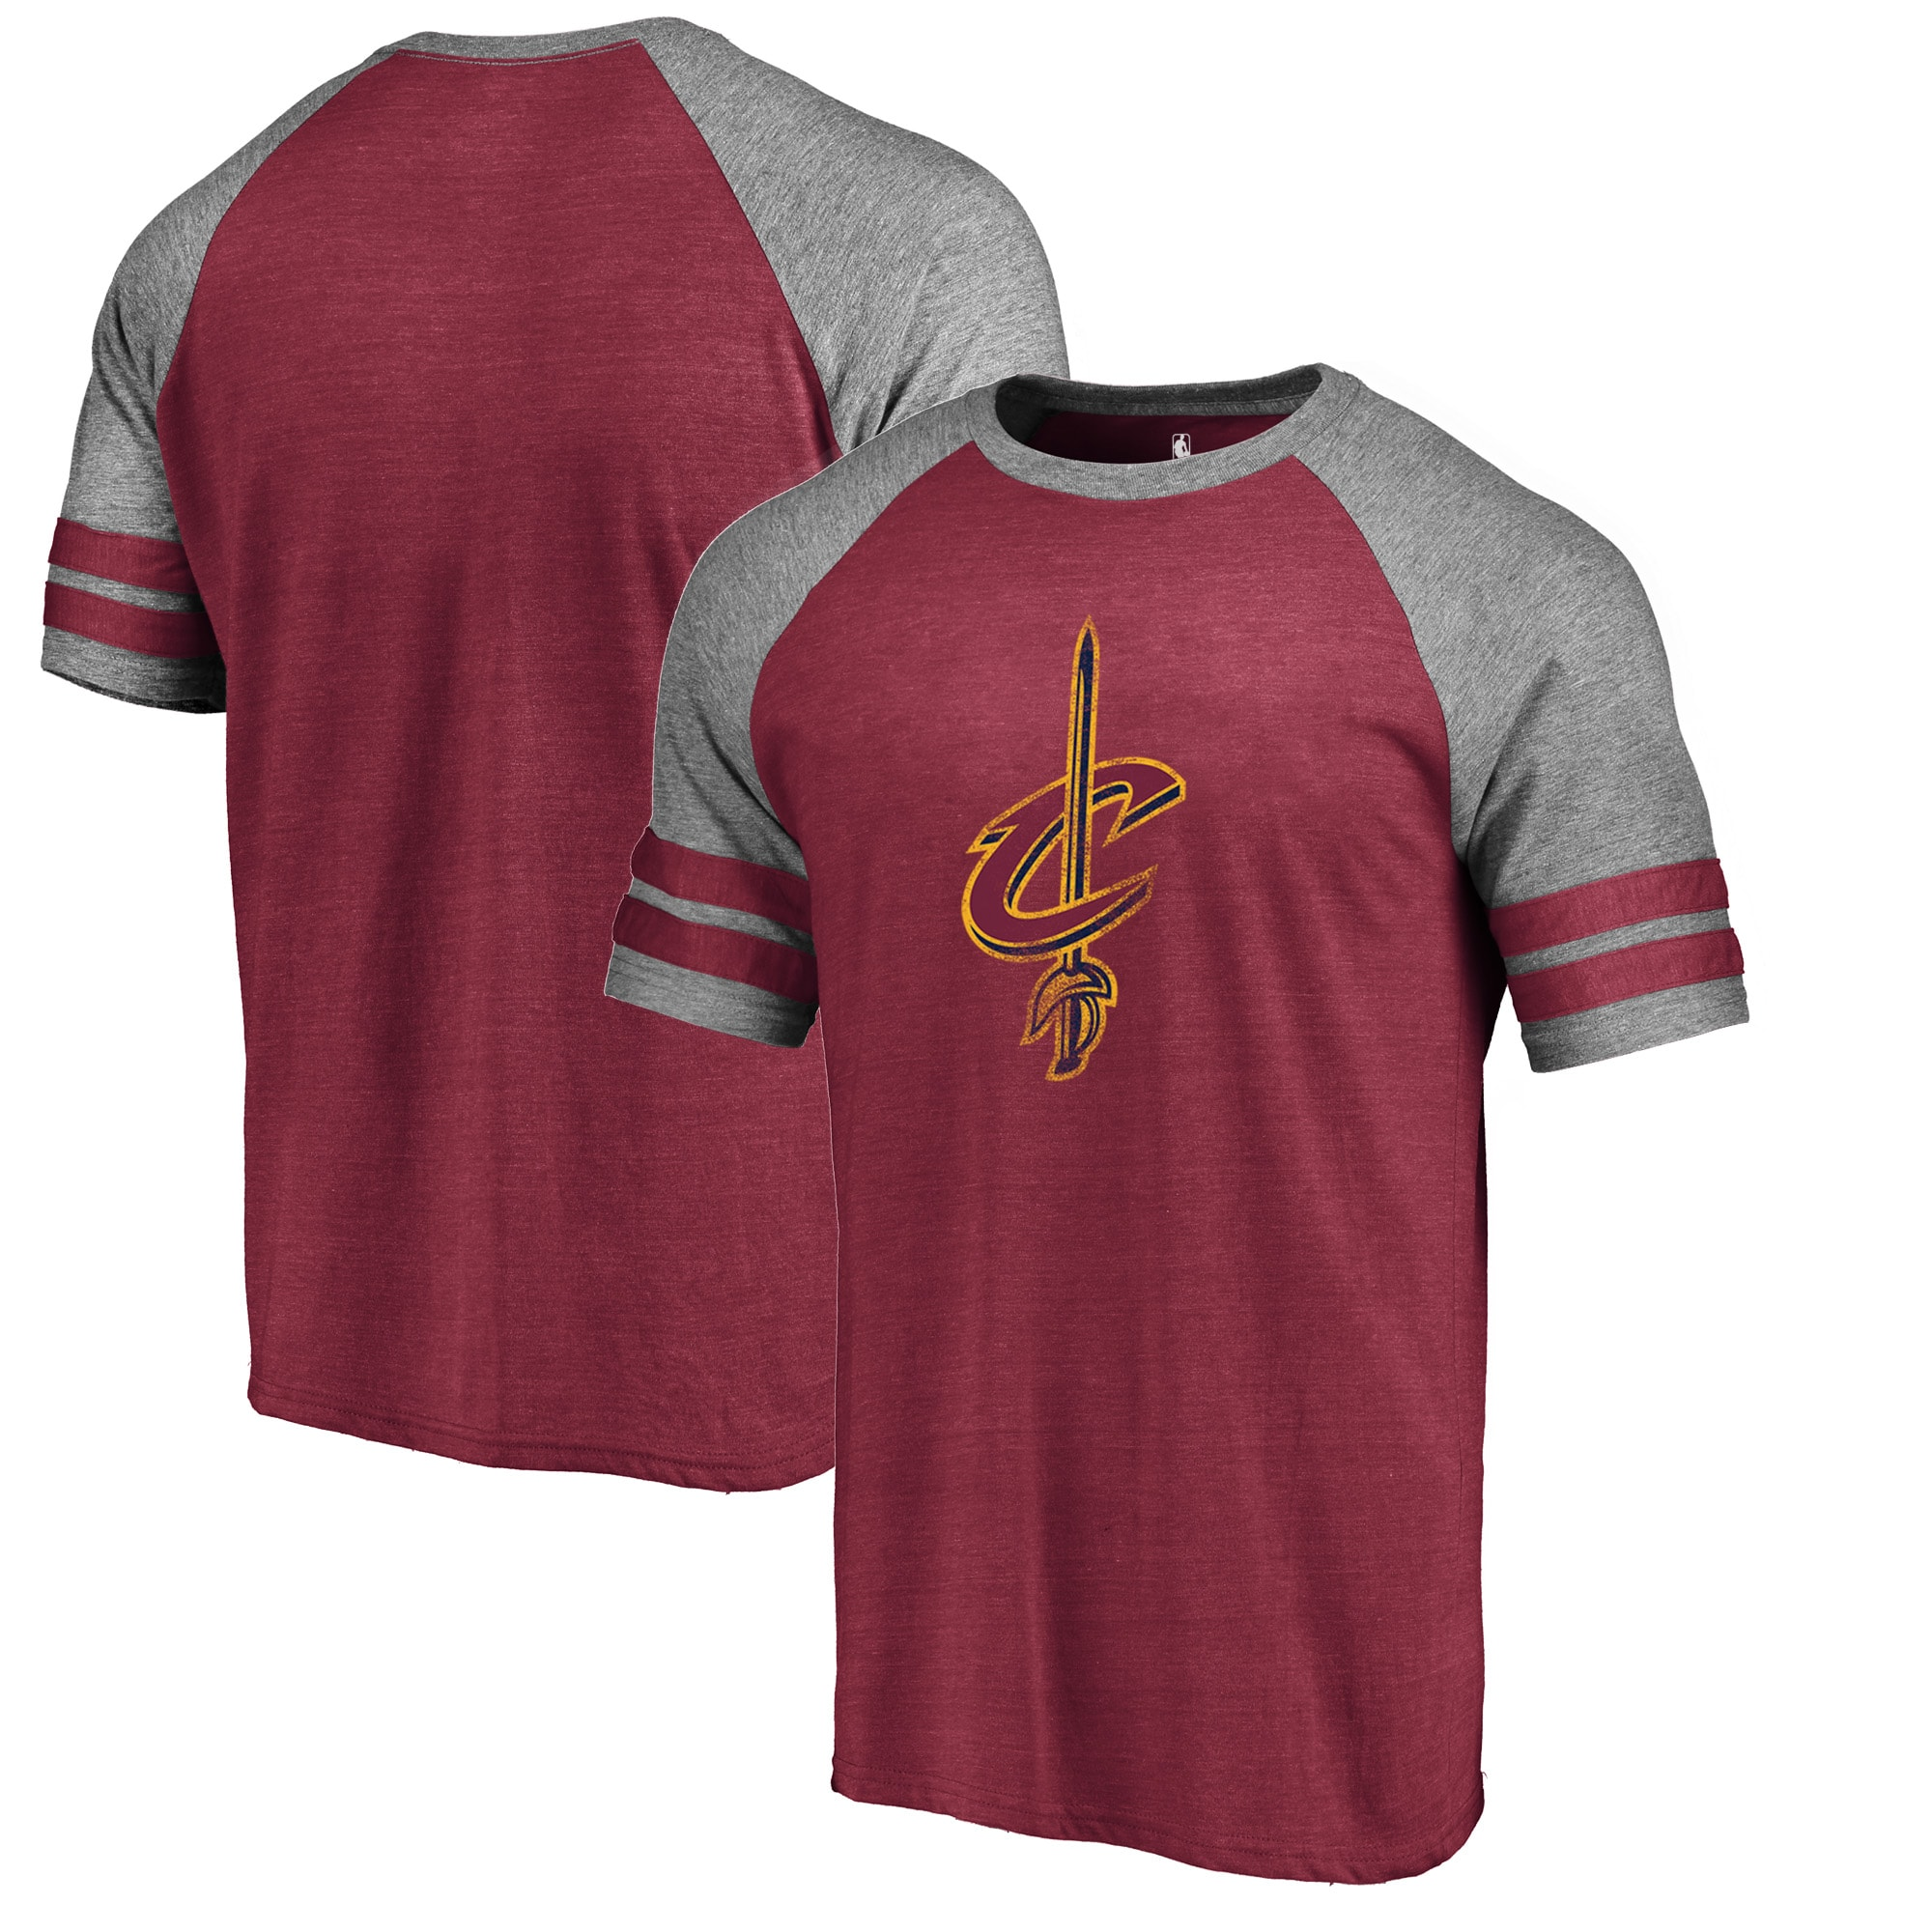 Cleveland Cavaliers Fanatics Branded Distressed Logo Raglan Tri-Blend T-Shirt - Wine